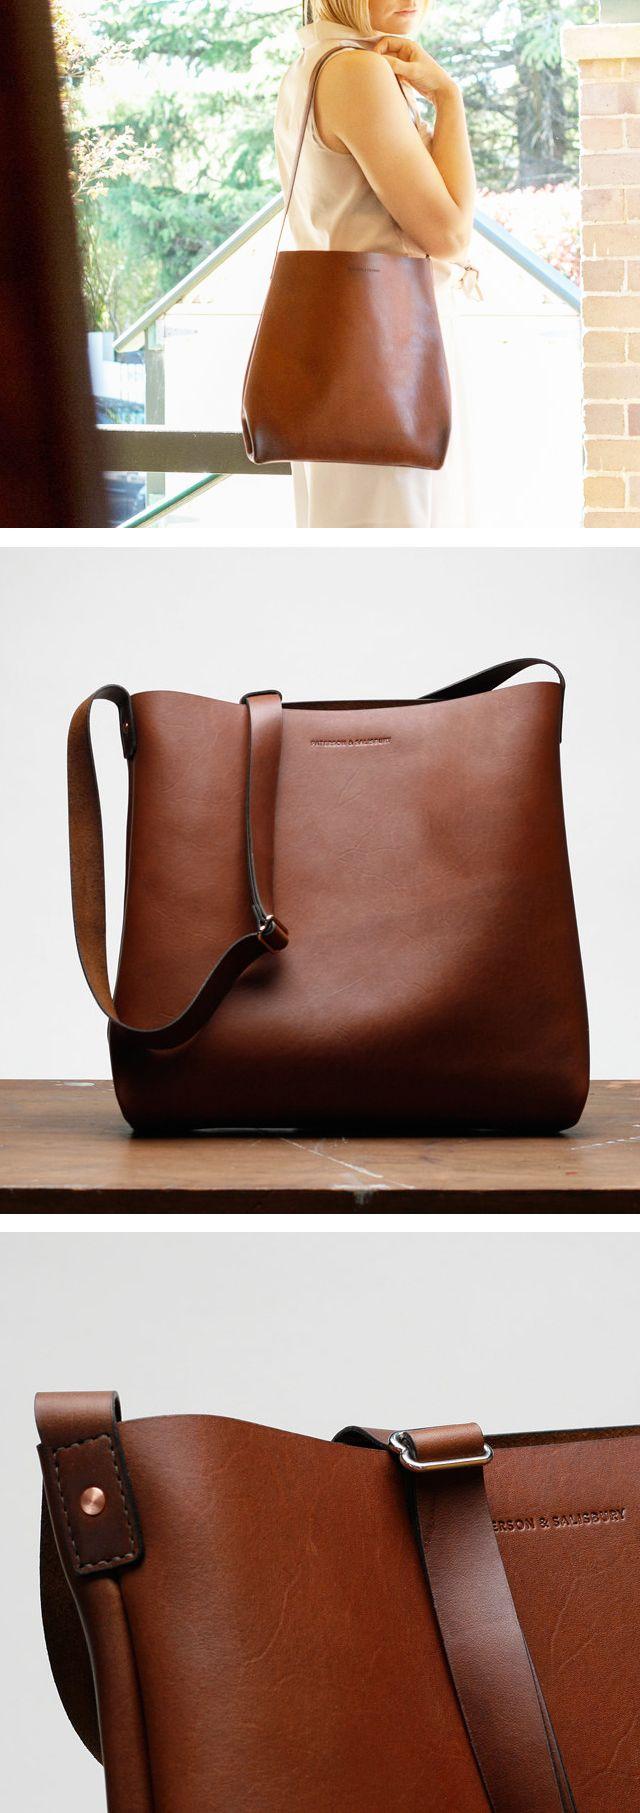 Australian Leather Tote Bag Small Shoulder Bag Crossbody Cross Body Satchel Brown Laptop Macbook Tote Bag Leather Shoulder Bag Women Leather Tote Bag